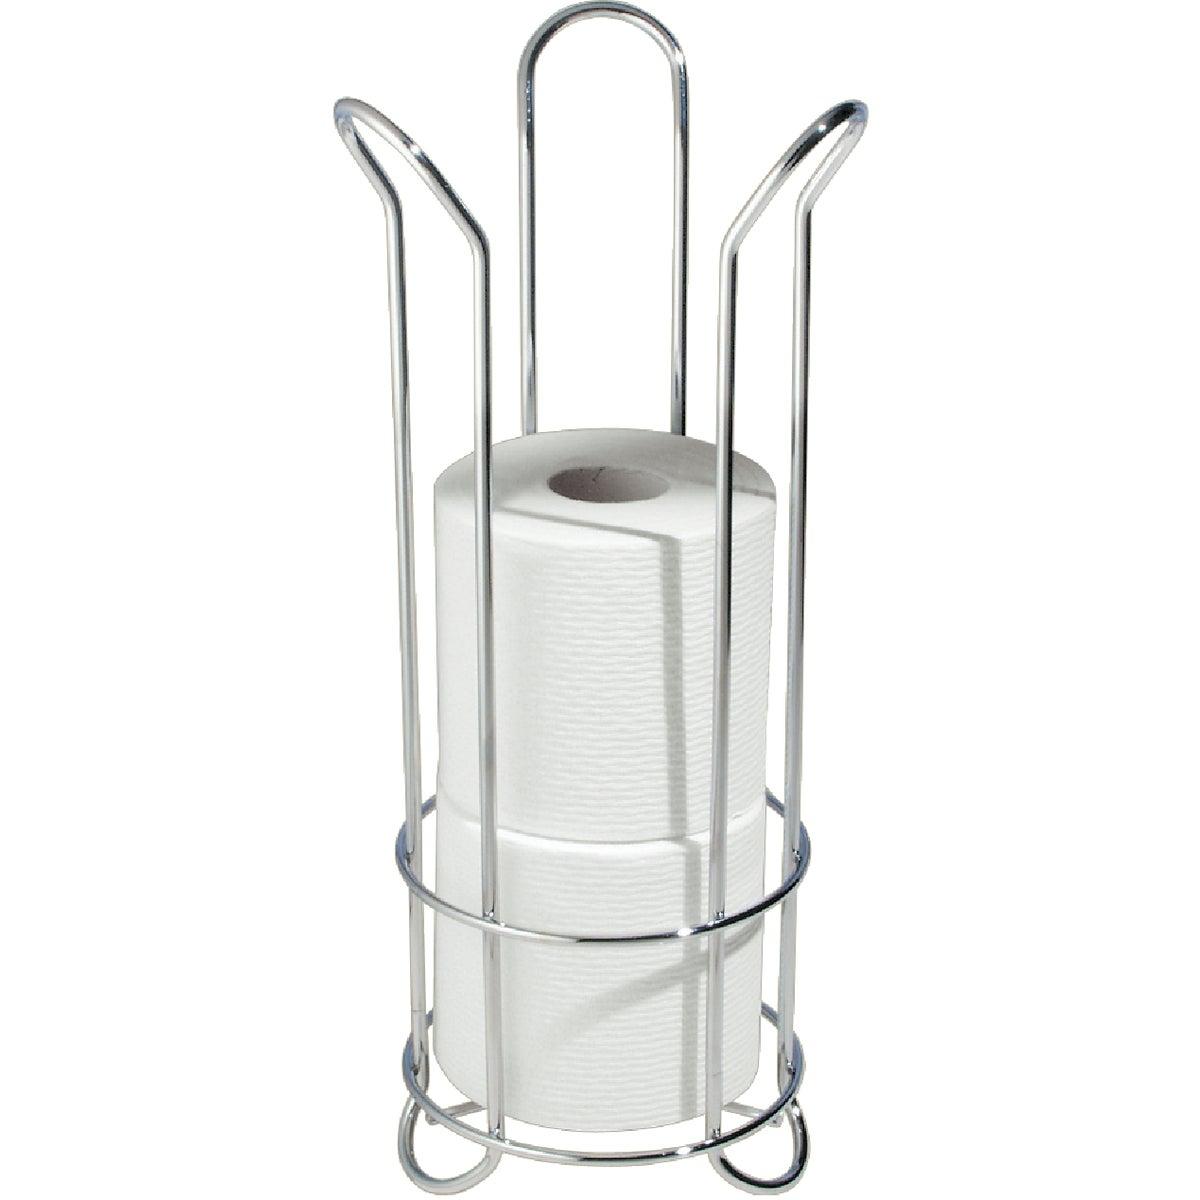 Interdesign TOILET PAPER HOLDER 68620